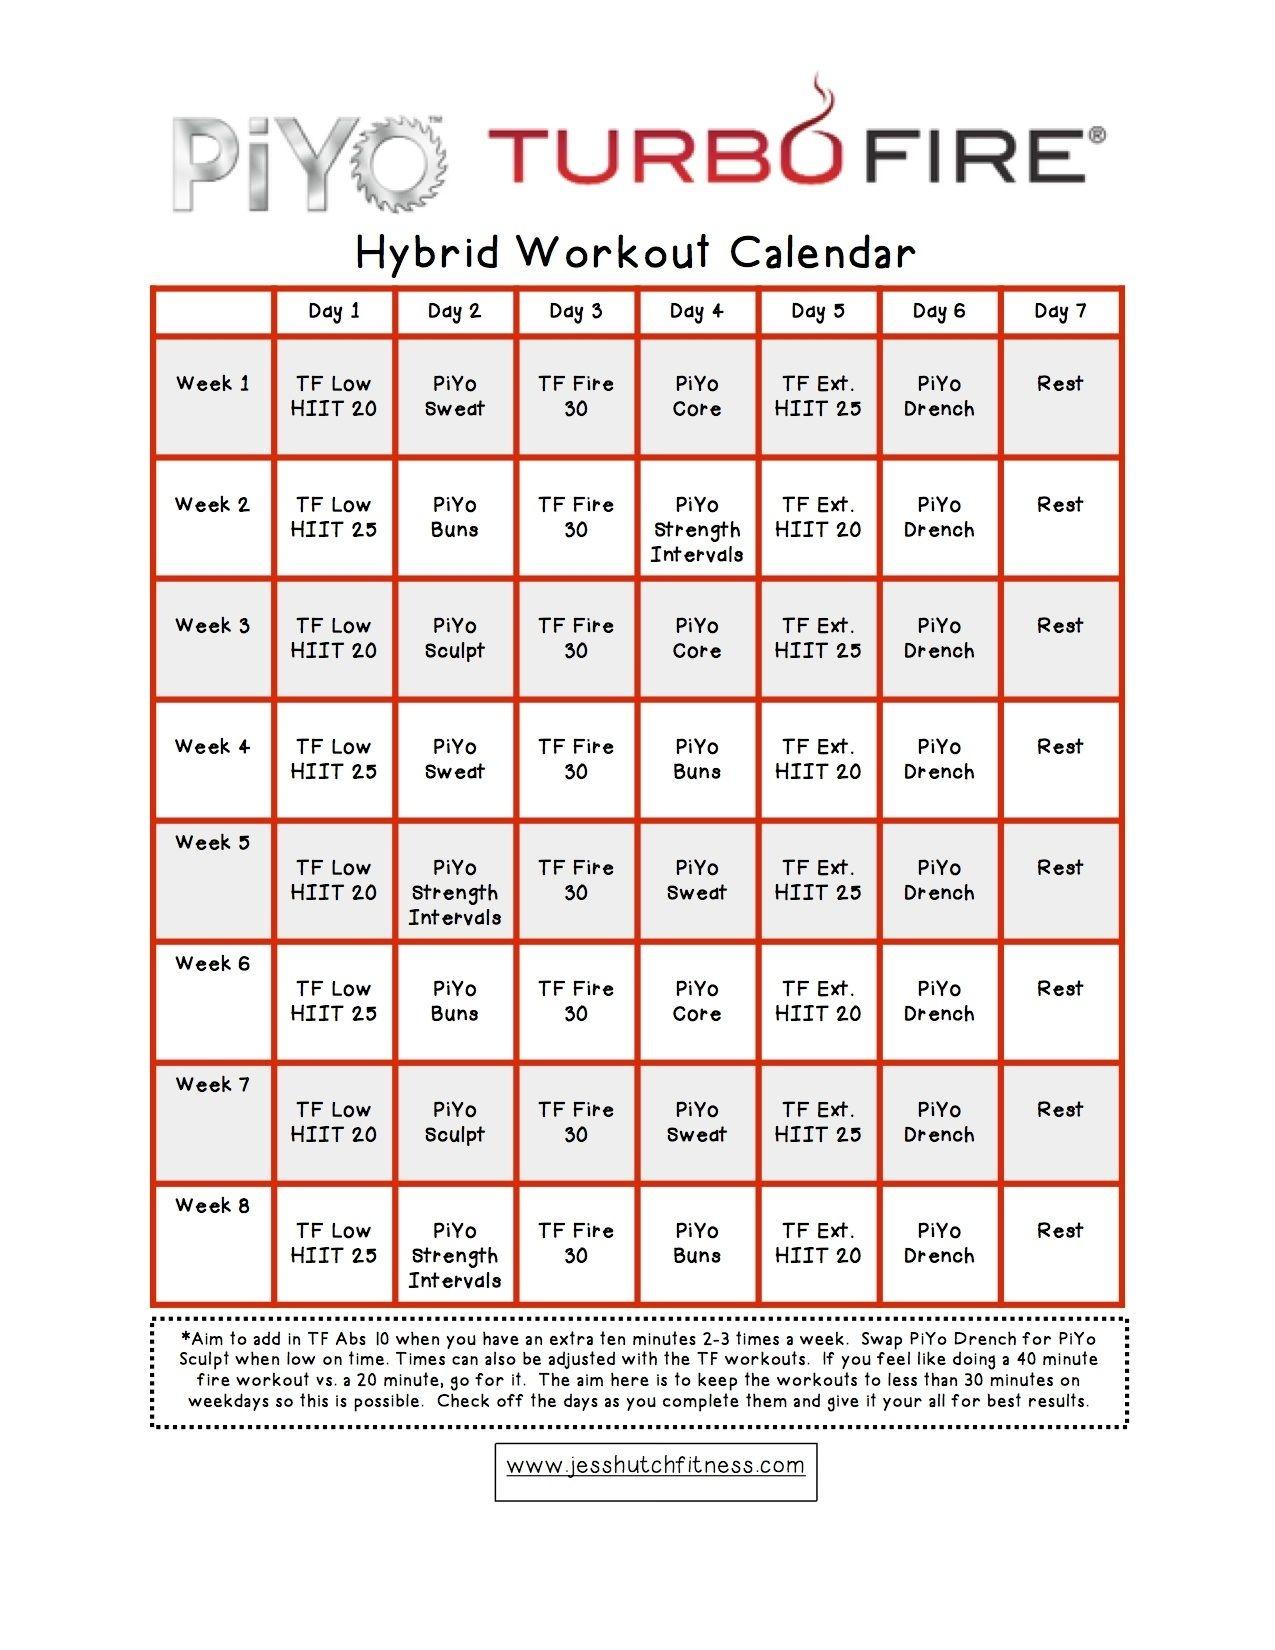 Piyo/turbofire Hybrid Calendar   Workout Calendar, Body Pump